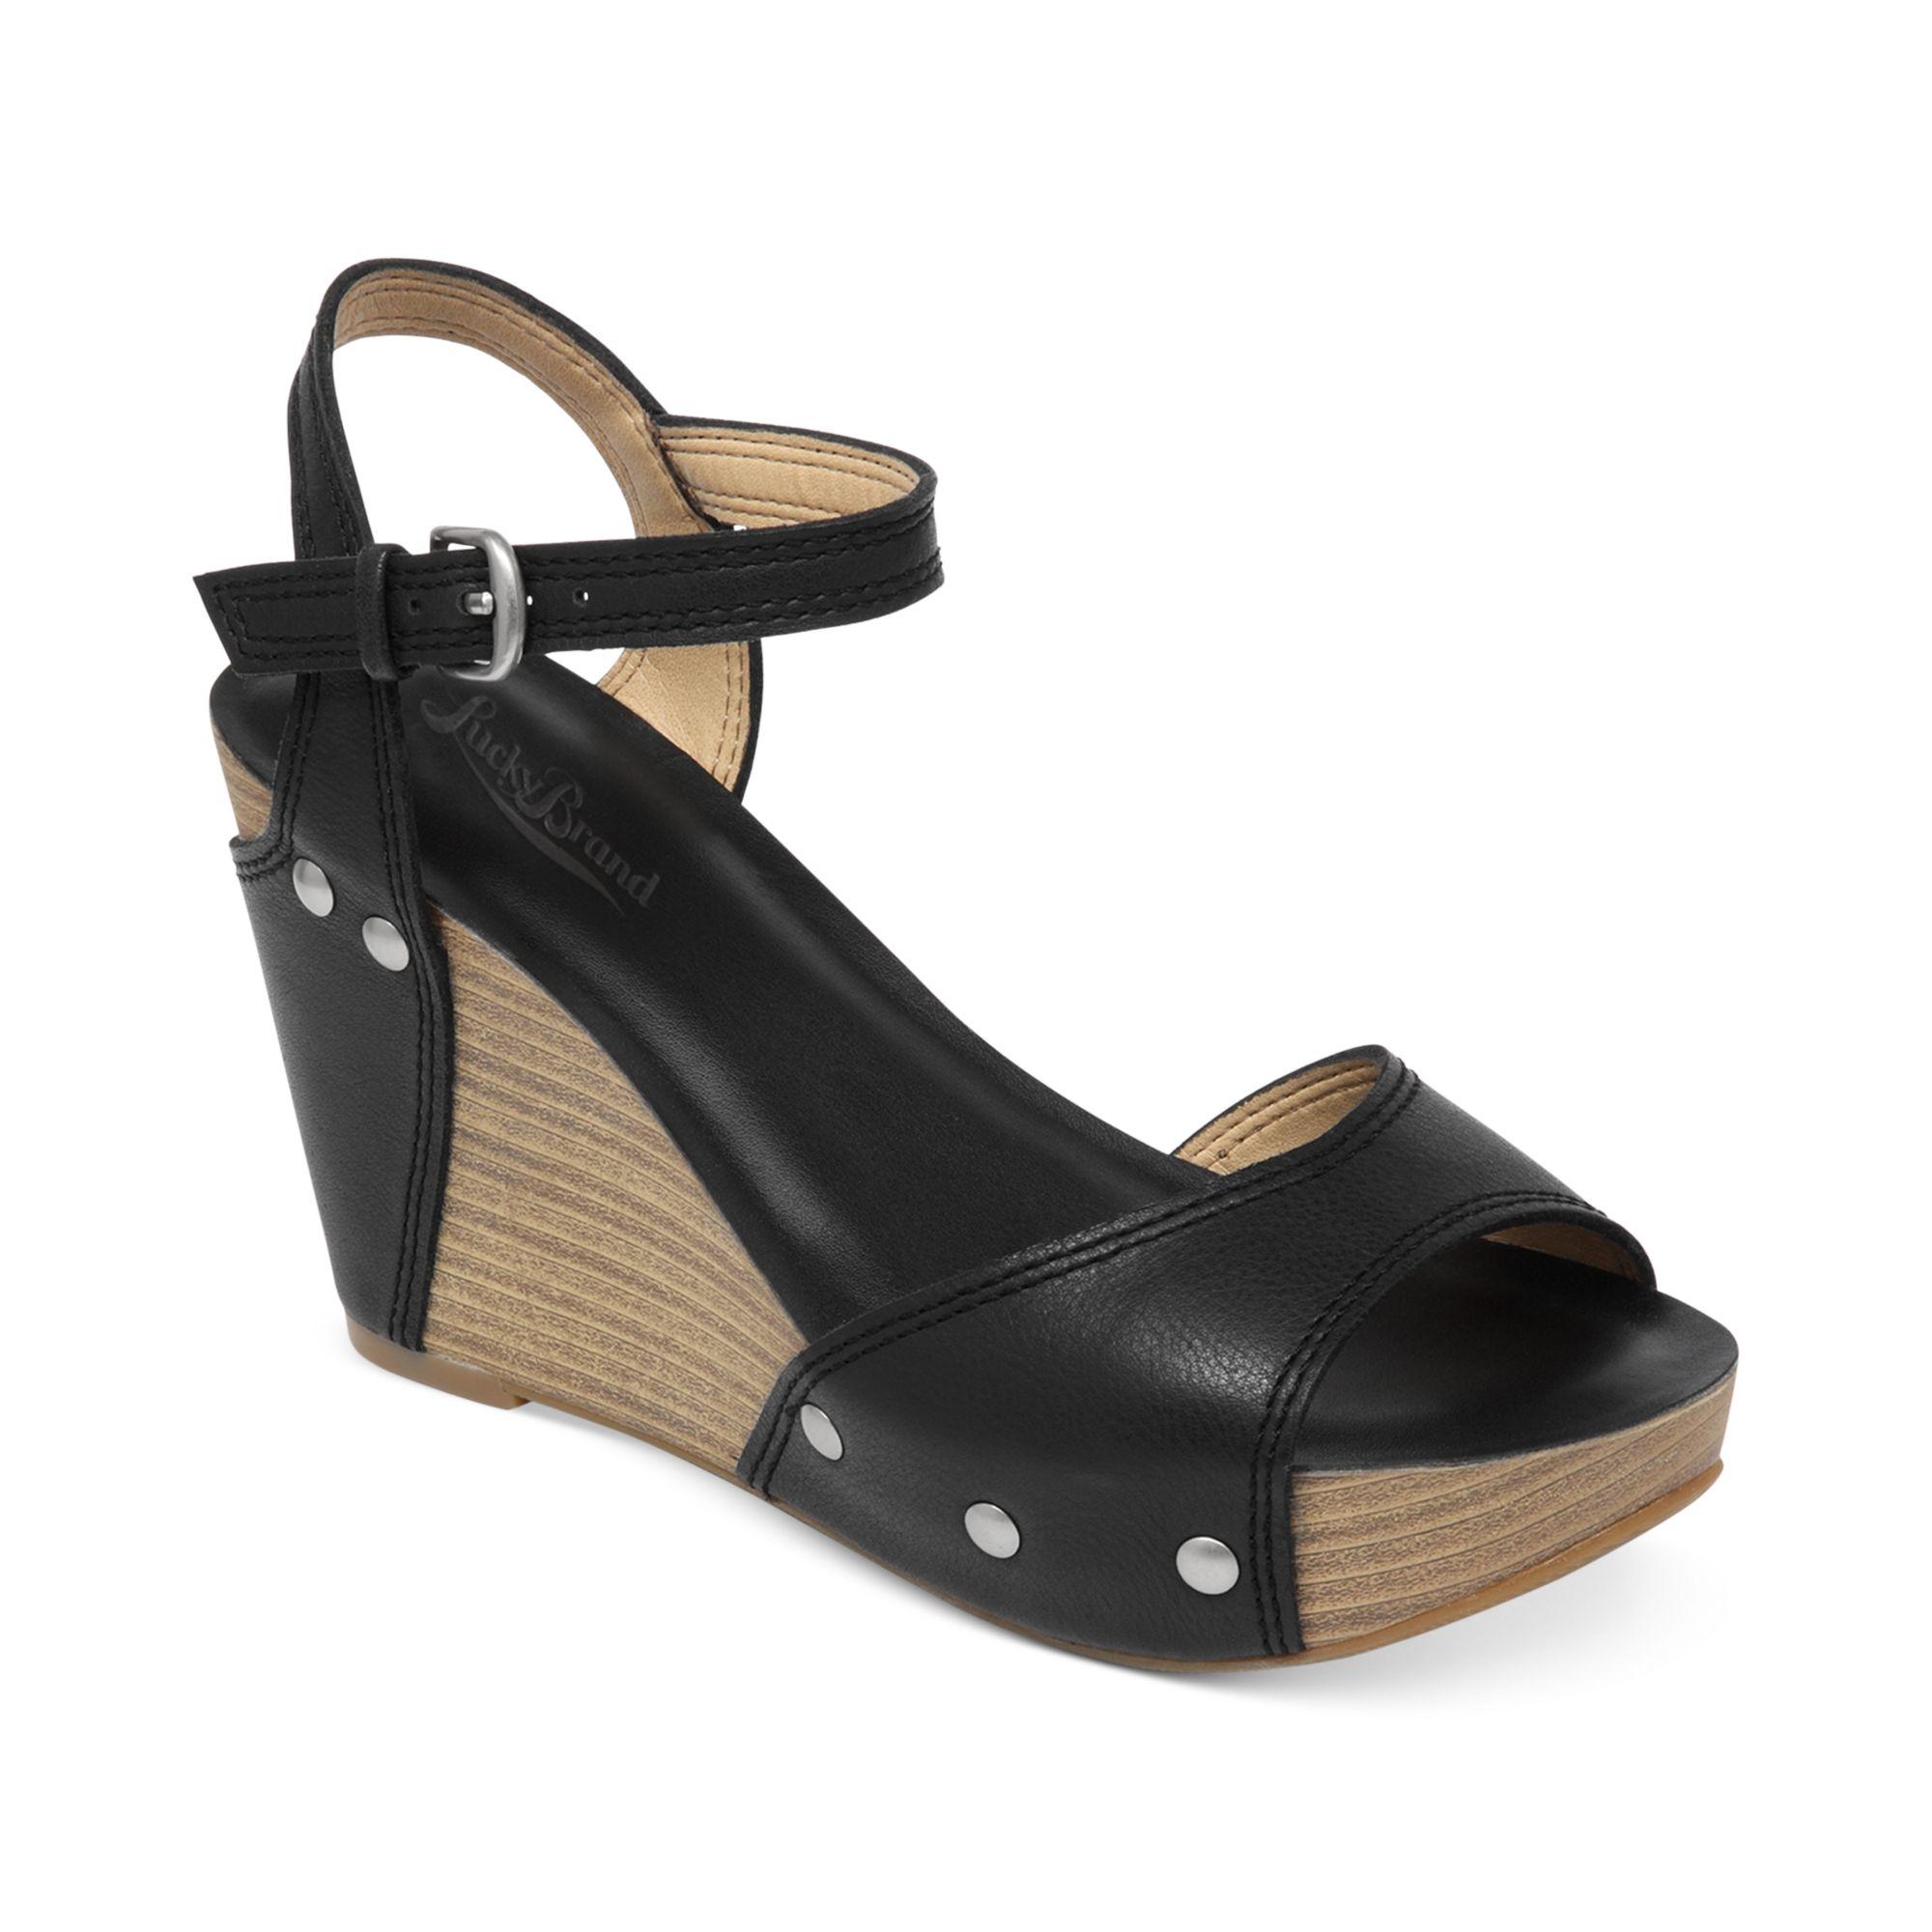 a31a12406 Lucky Brand Marshha Platform Wedge Sandals in Black - Lyst